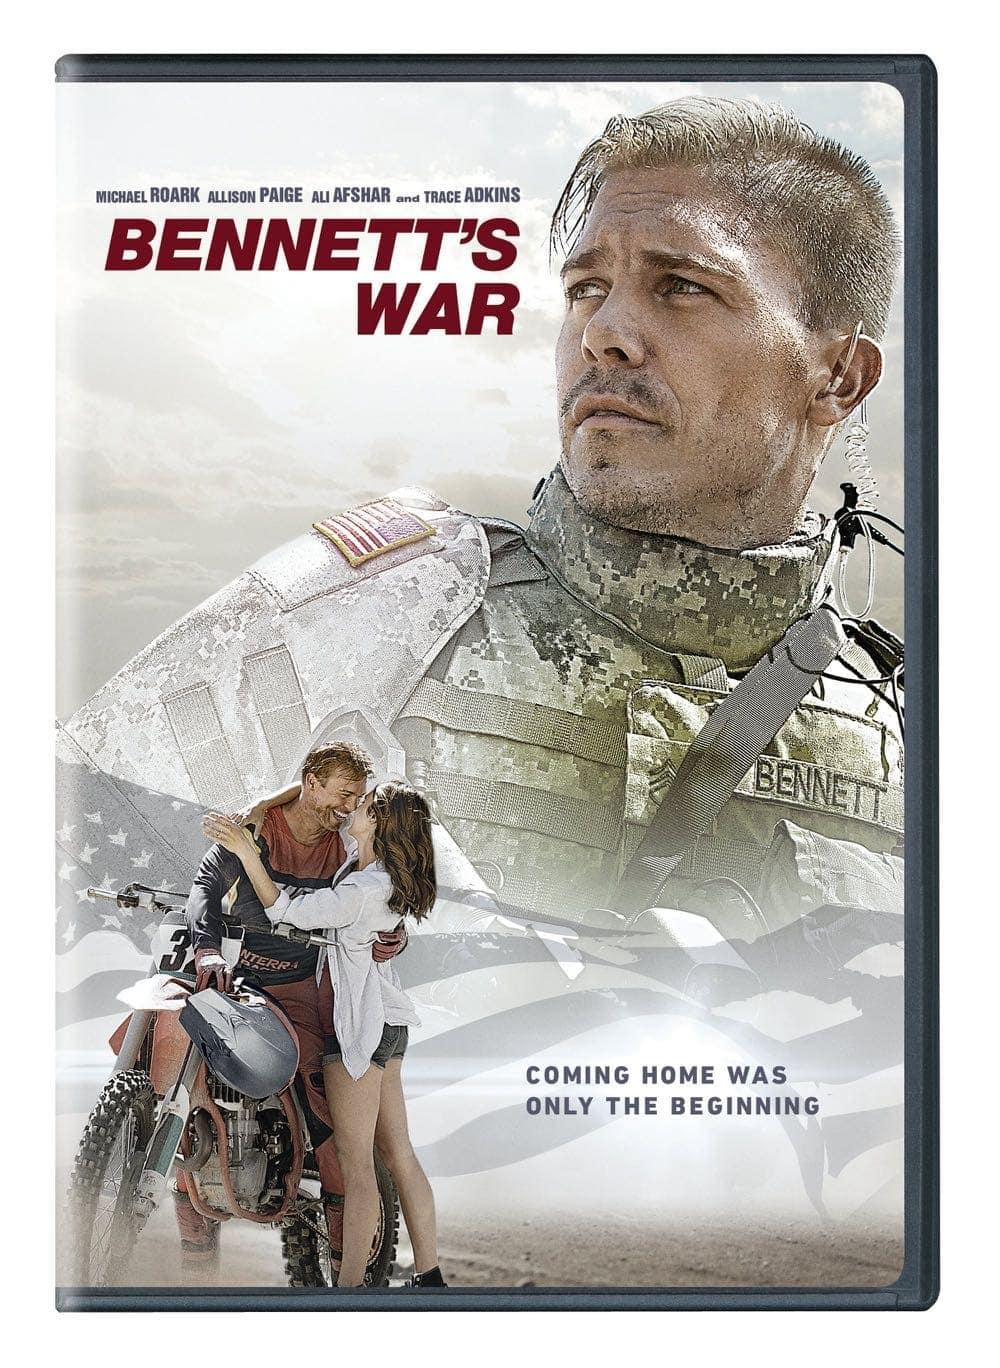 BENNETTS WAR 1000749819 SD WRAP 2D FINAL DOM SKEW 319ae838